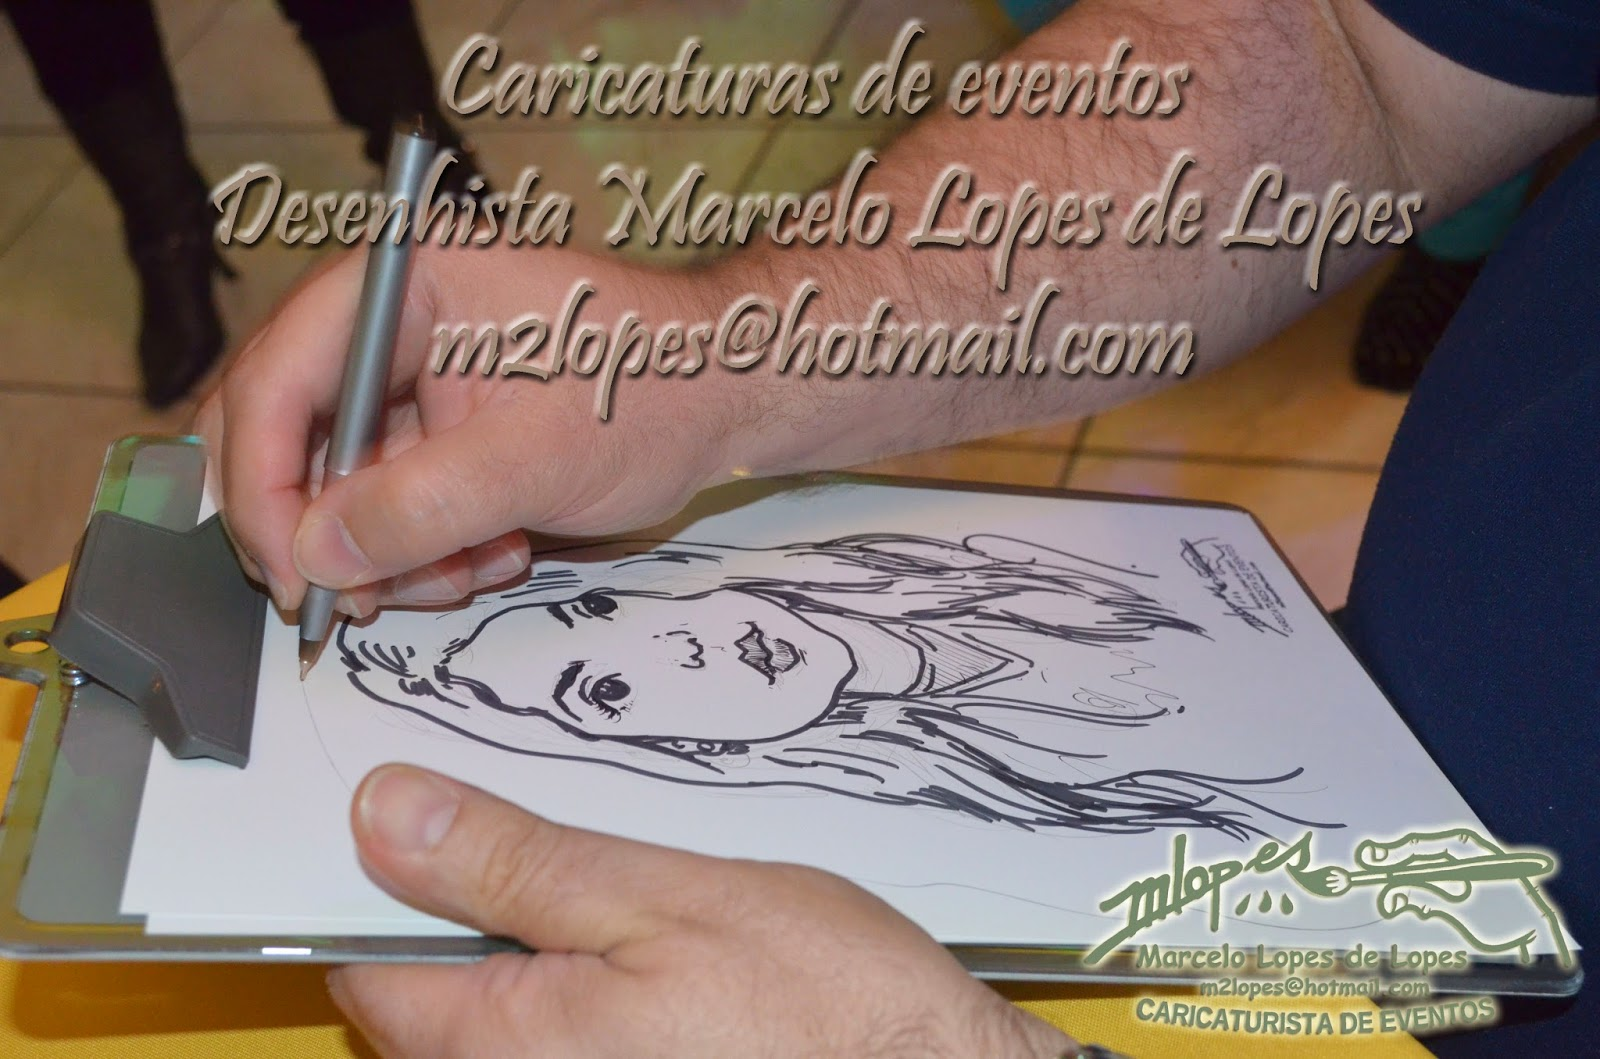 Contrate o Desenhista Marcelo Lopes de Lopes para sua festa